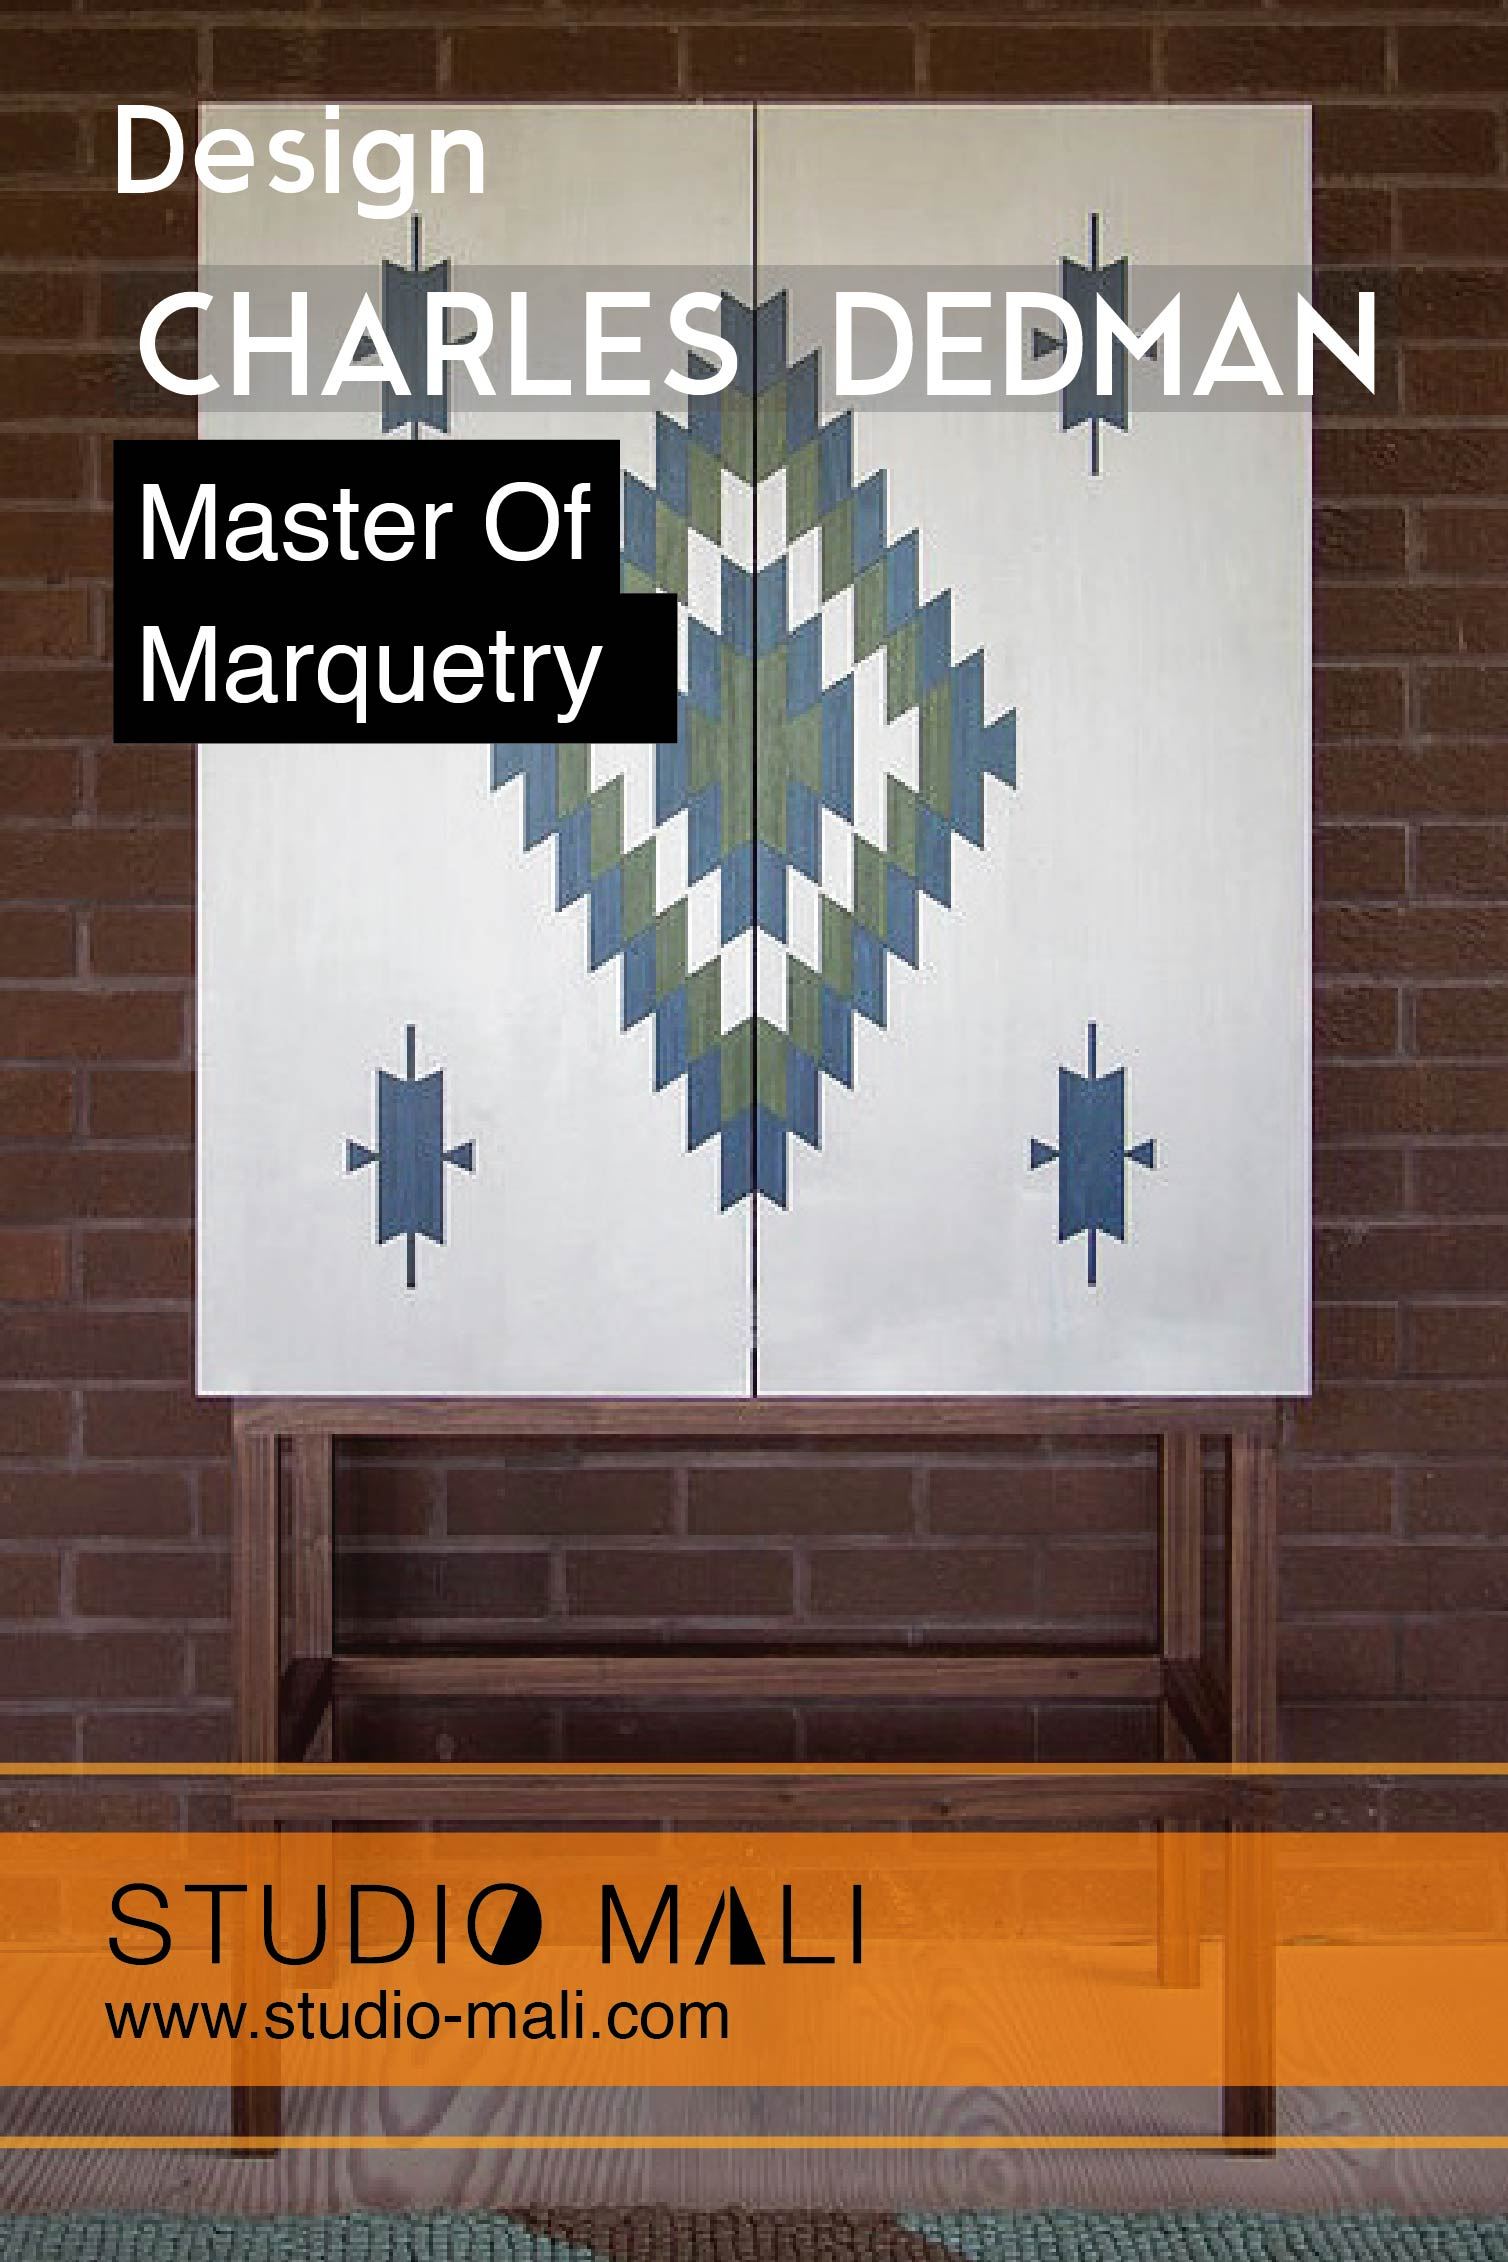 Design - Charles Dedman - Master Of Marquetry, By Studio Mali.jpg